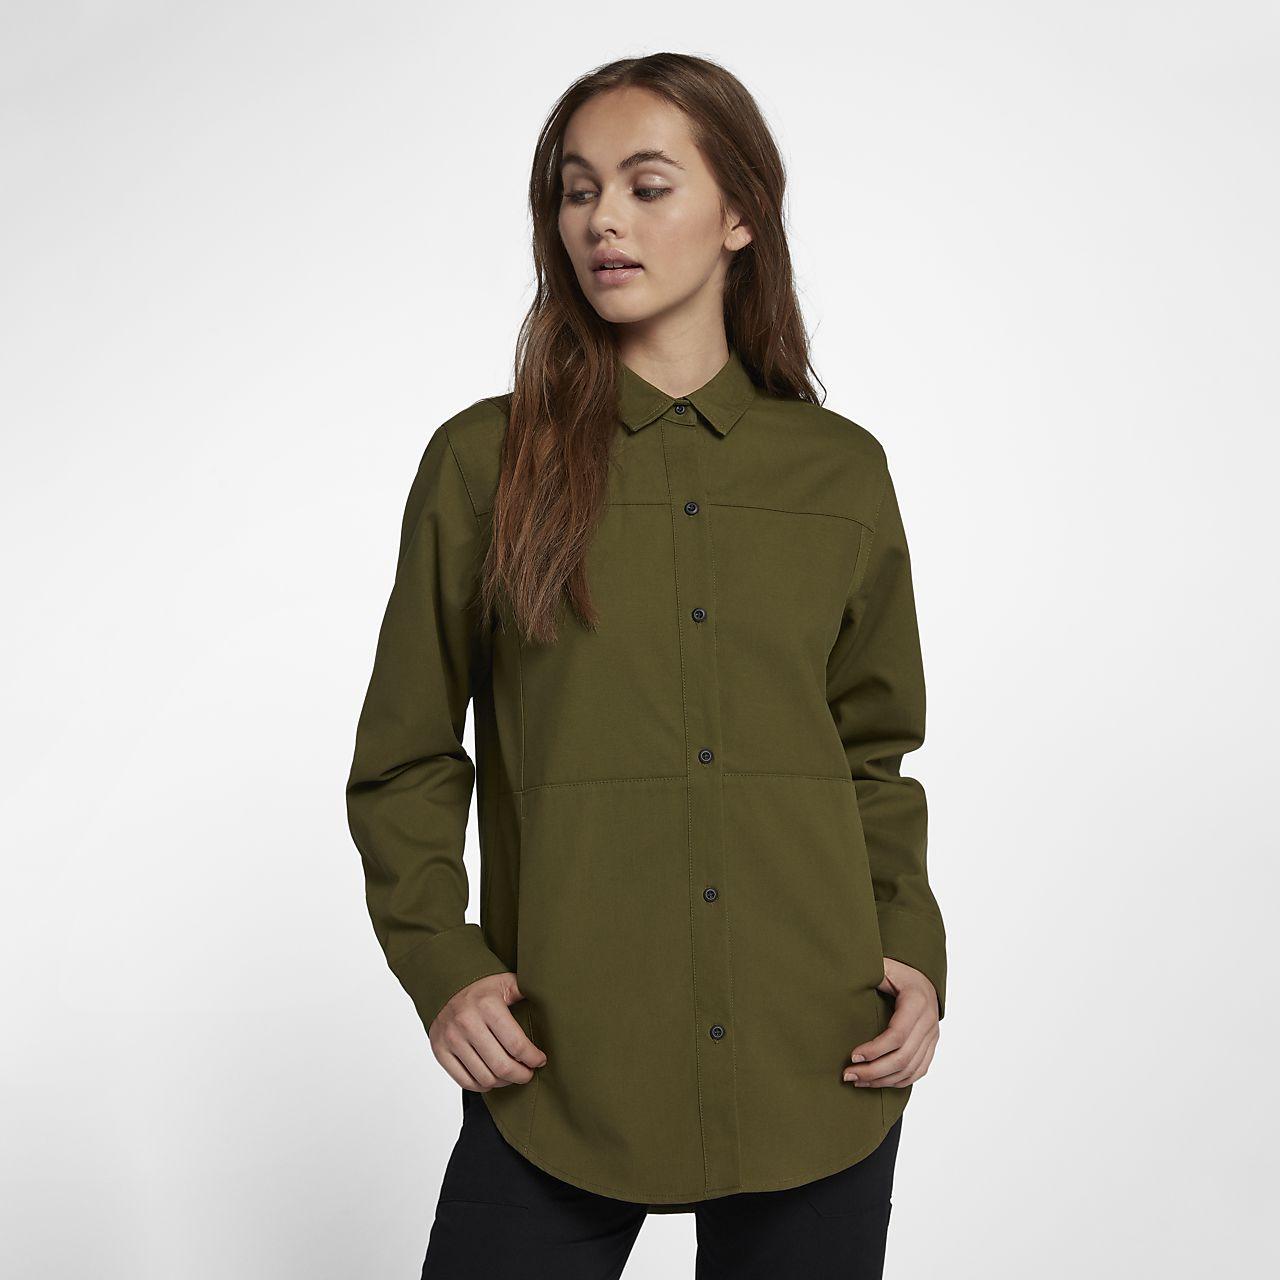 Hurley Wilson Shacket Women's Jacket